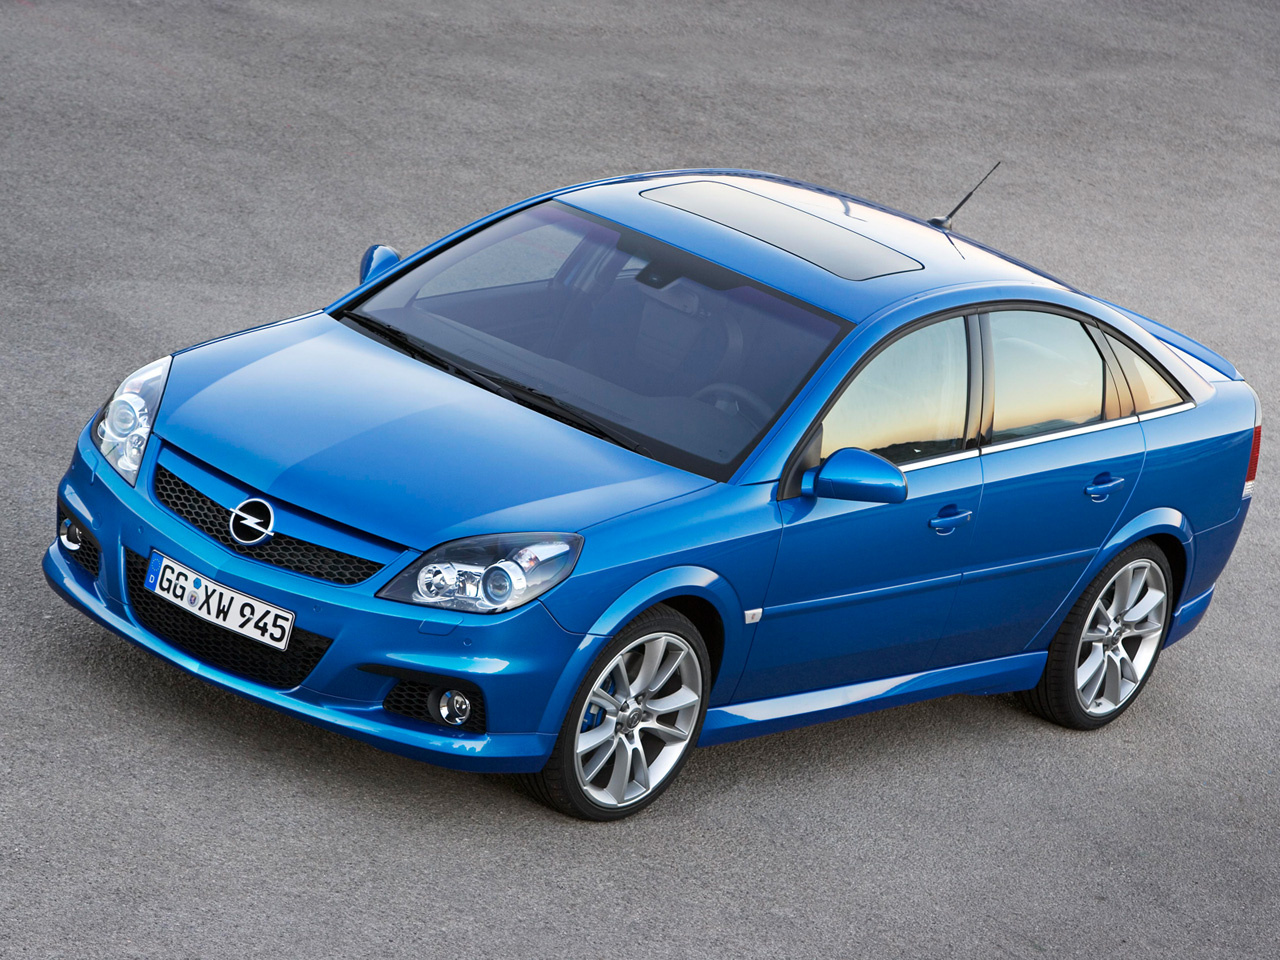 2007 Opel Vectra - Overview - CarGurus